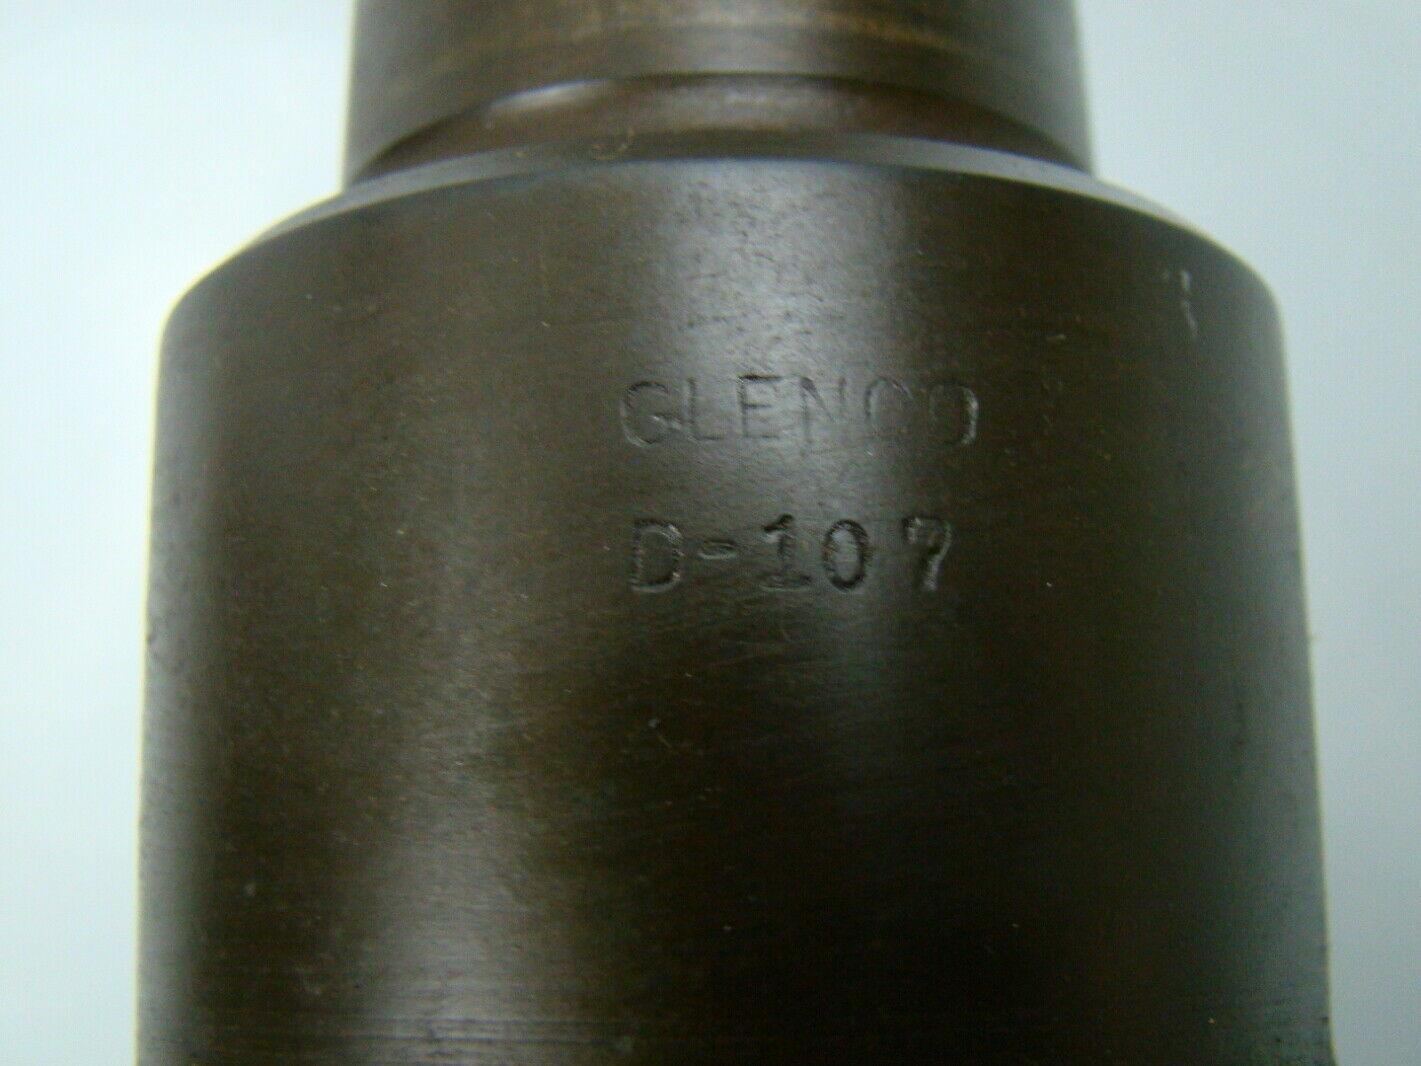 Eclipse USA 408-1310 HSS Porting Tool #4 Short Morse Taper Shank